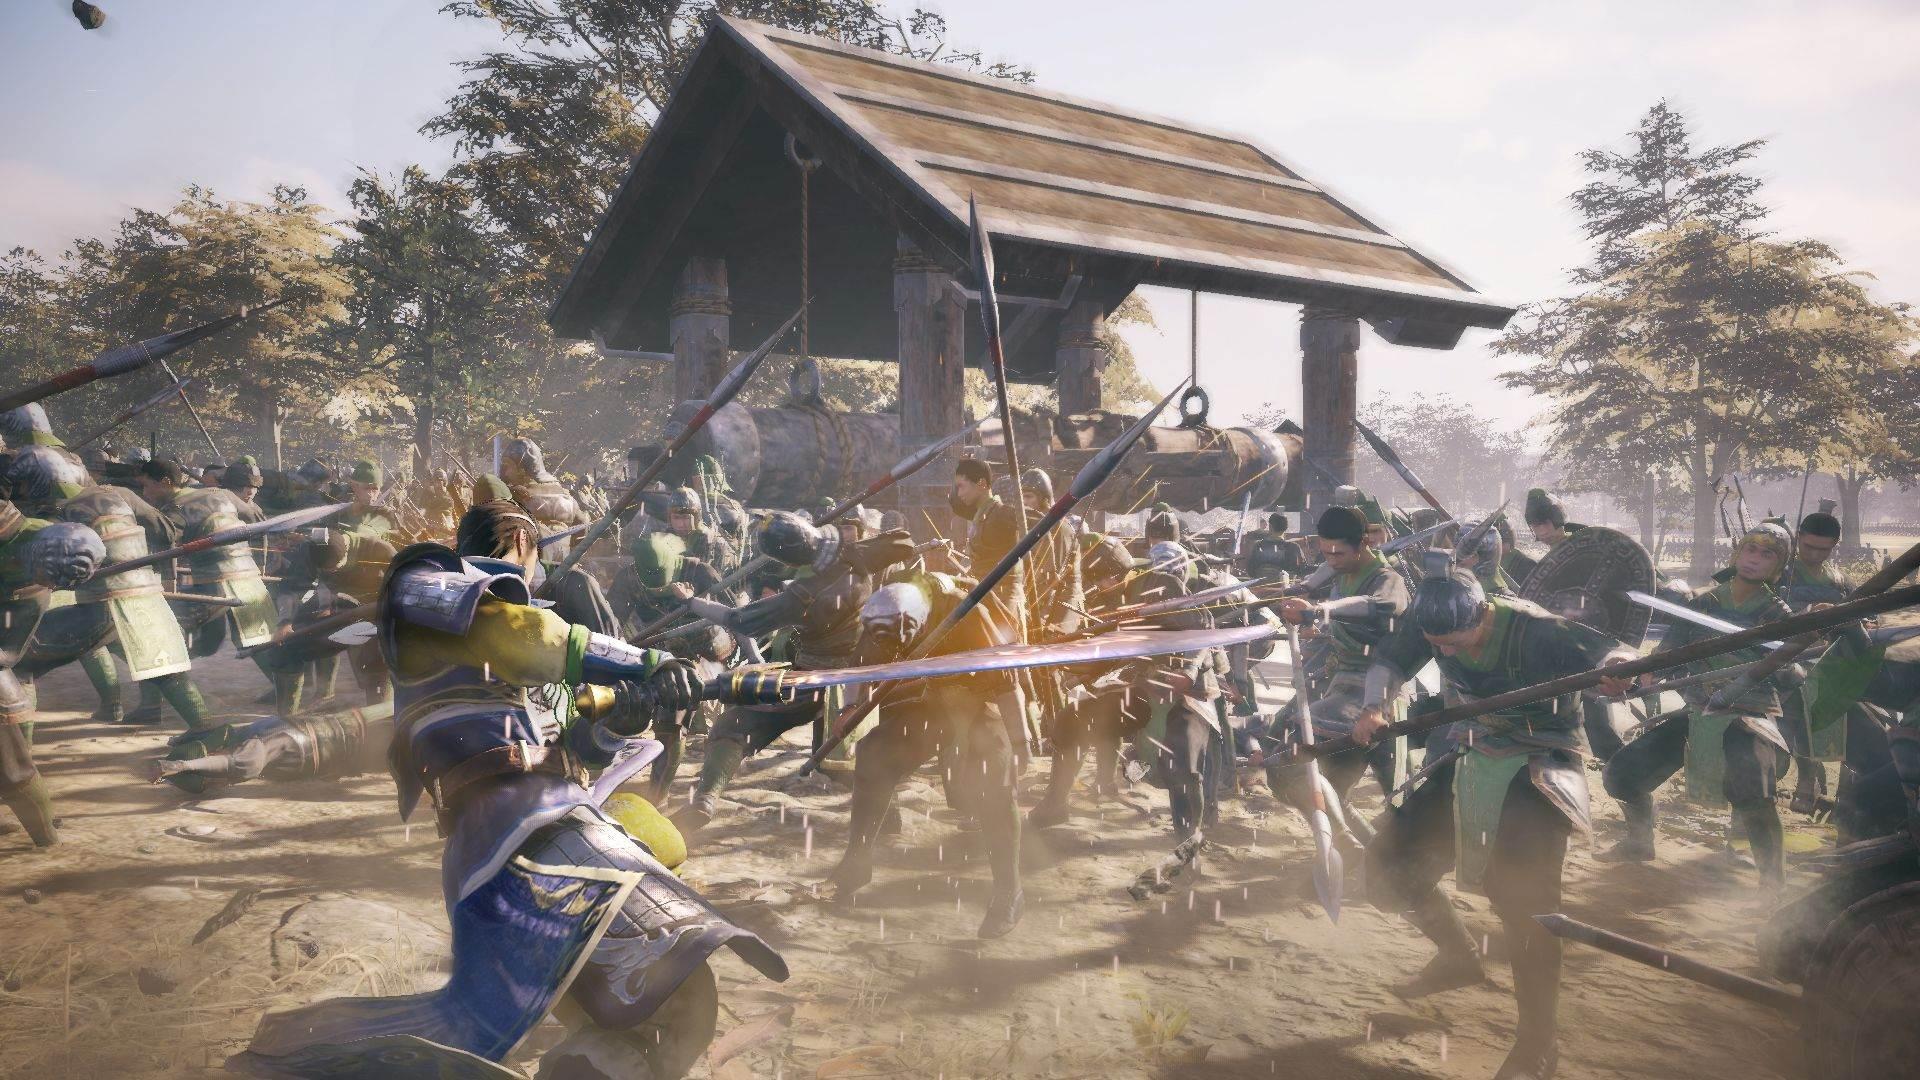 http://www.playm.de/wp-content/uploads/2017/08/Dynasty-Warriors-9-Bild-7.jpg